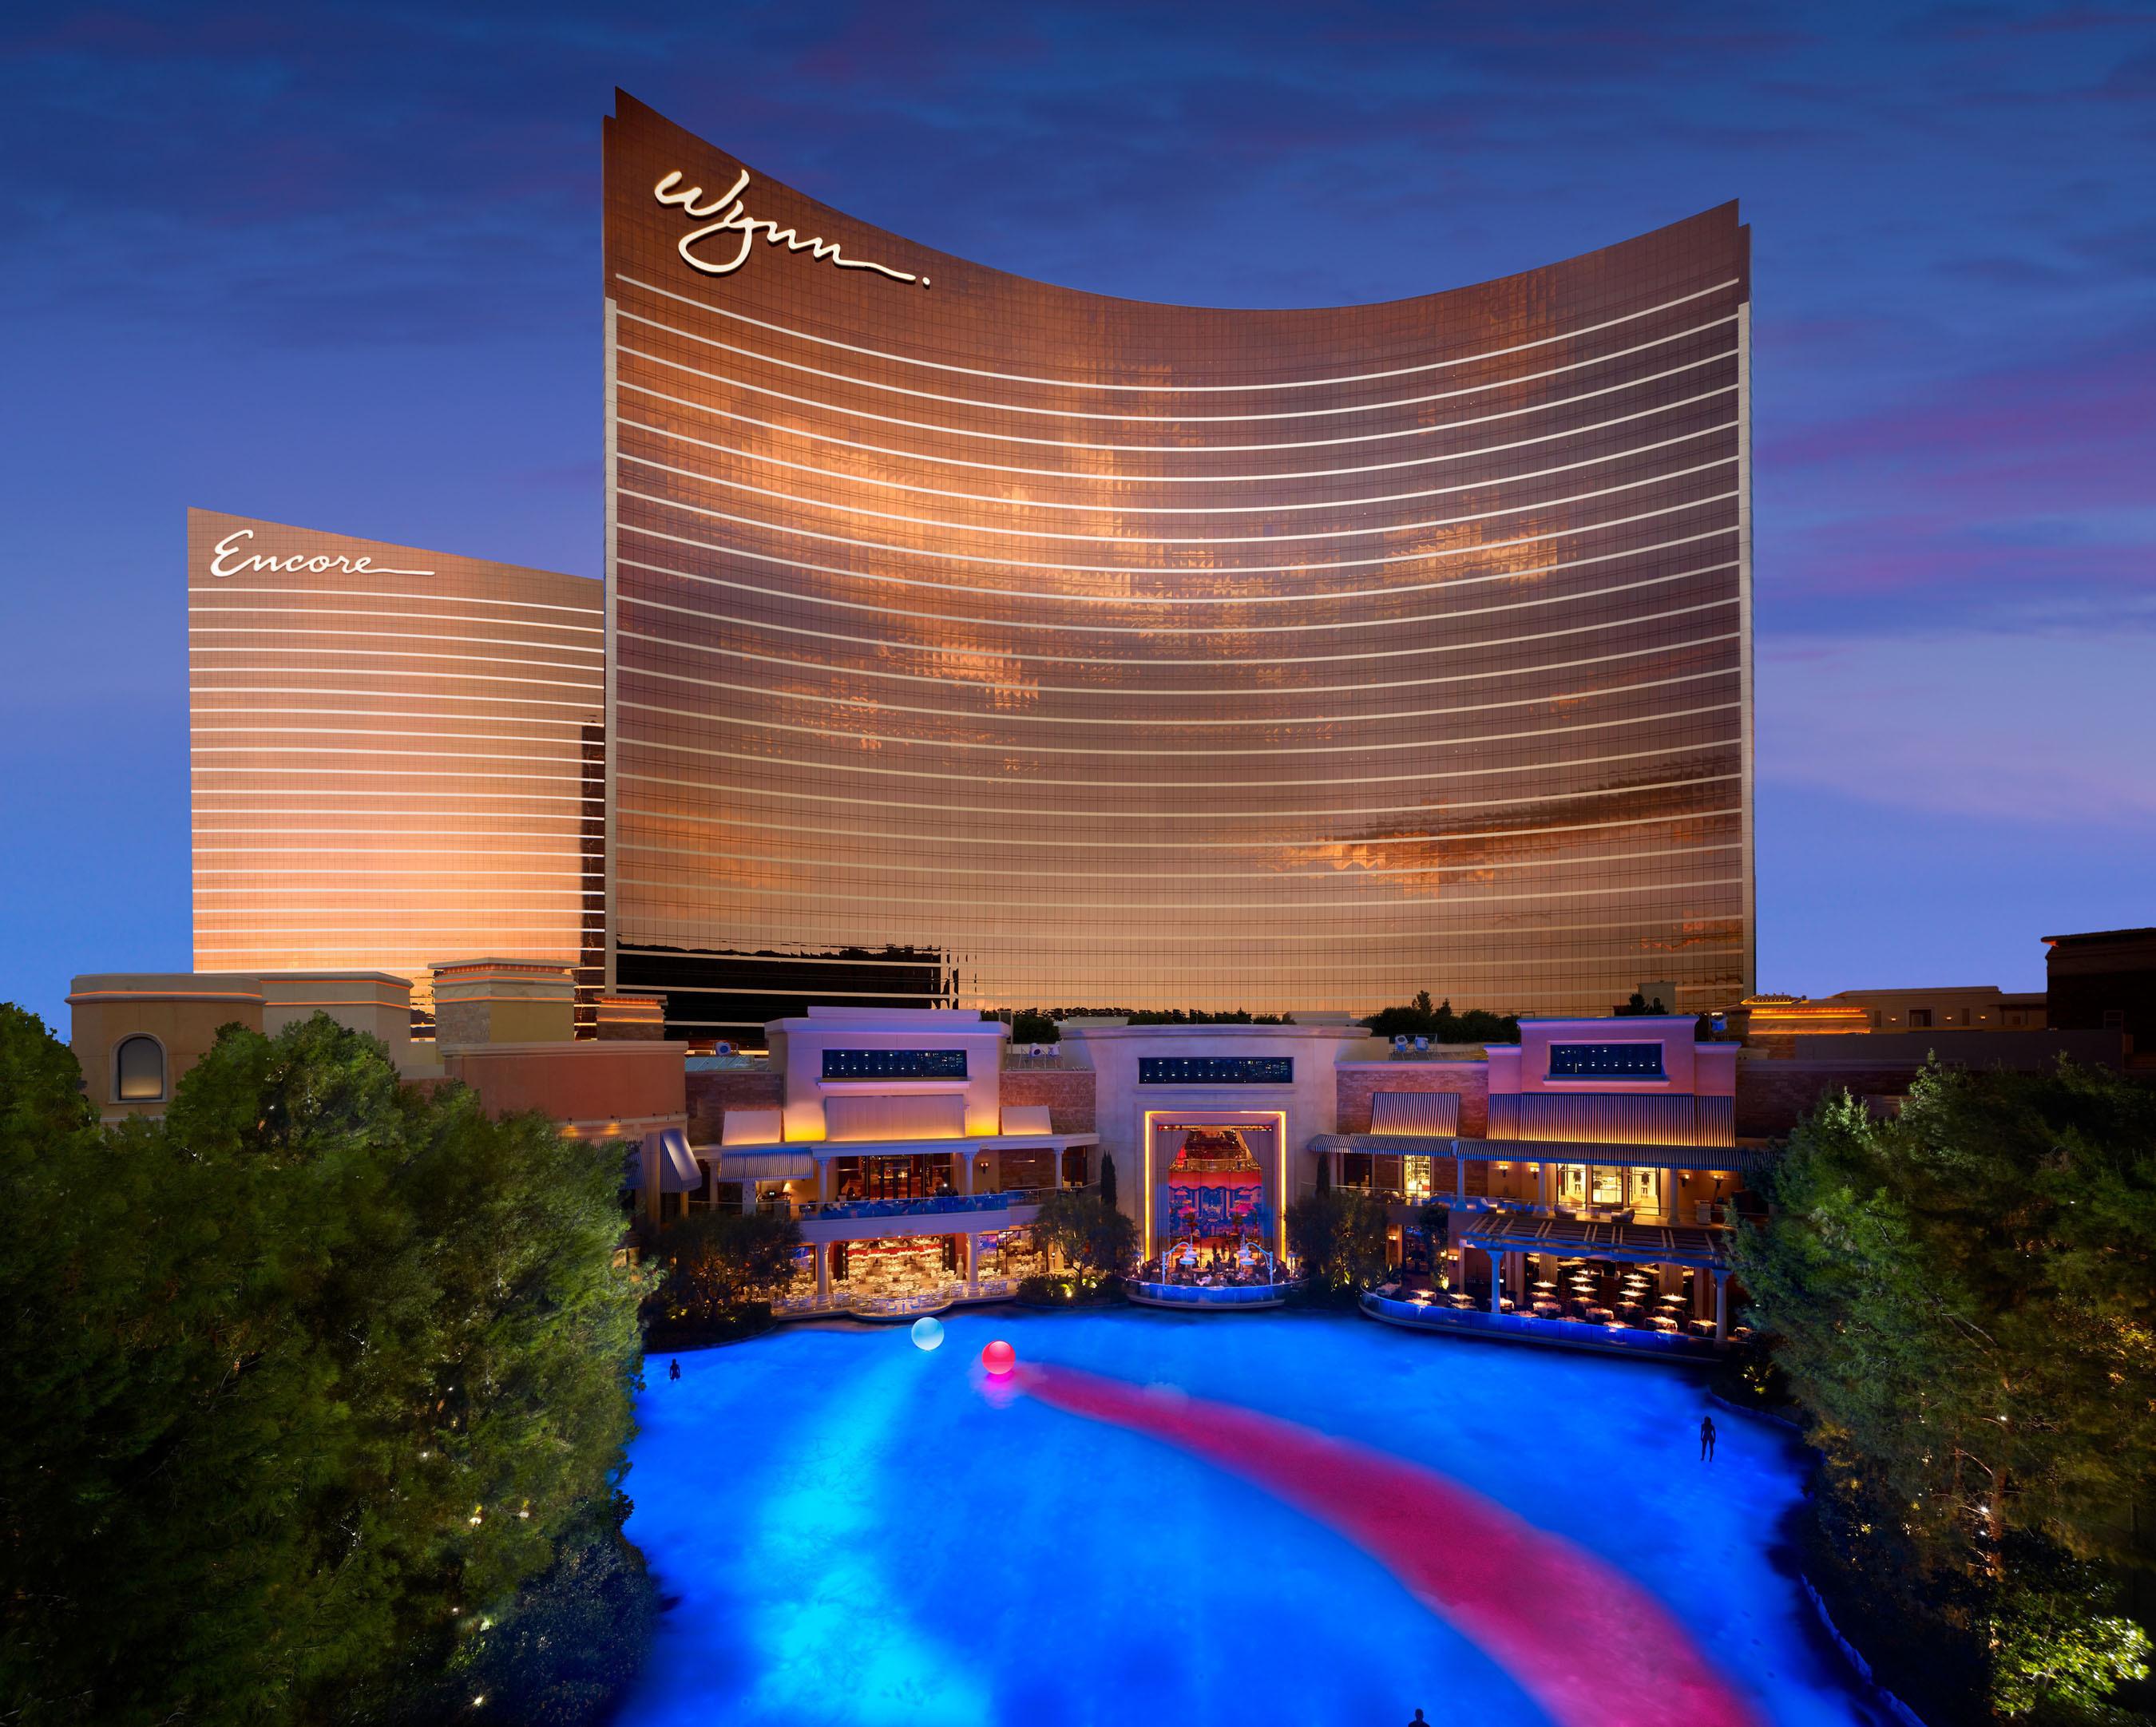 WYNN RESORTS WYNN LAS VEGAS: Wynn Las Vegas and Encore Named As 2013 Forbes Five-Star Award Winners.  (PRNewsFoto/Wynn Resorts)